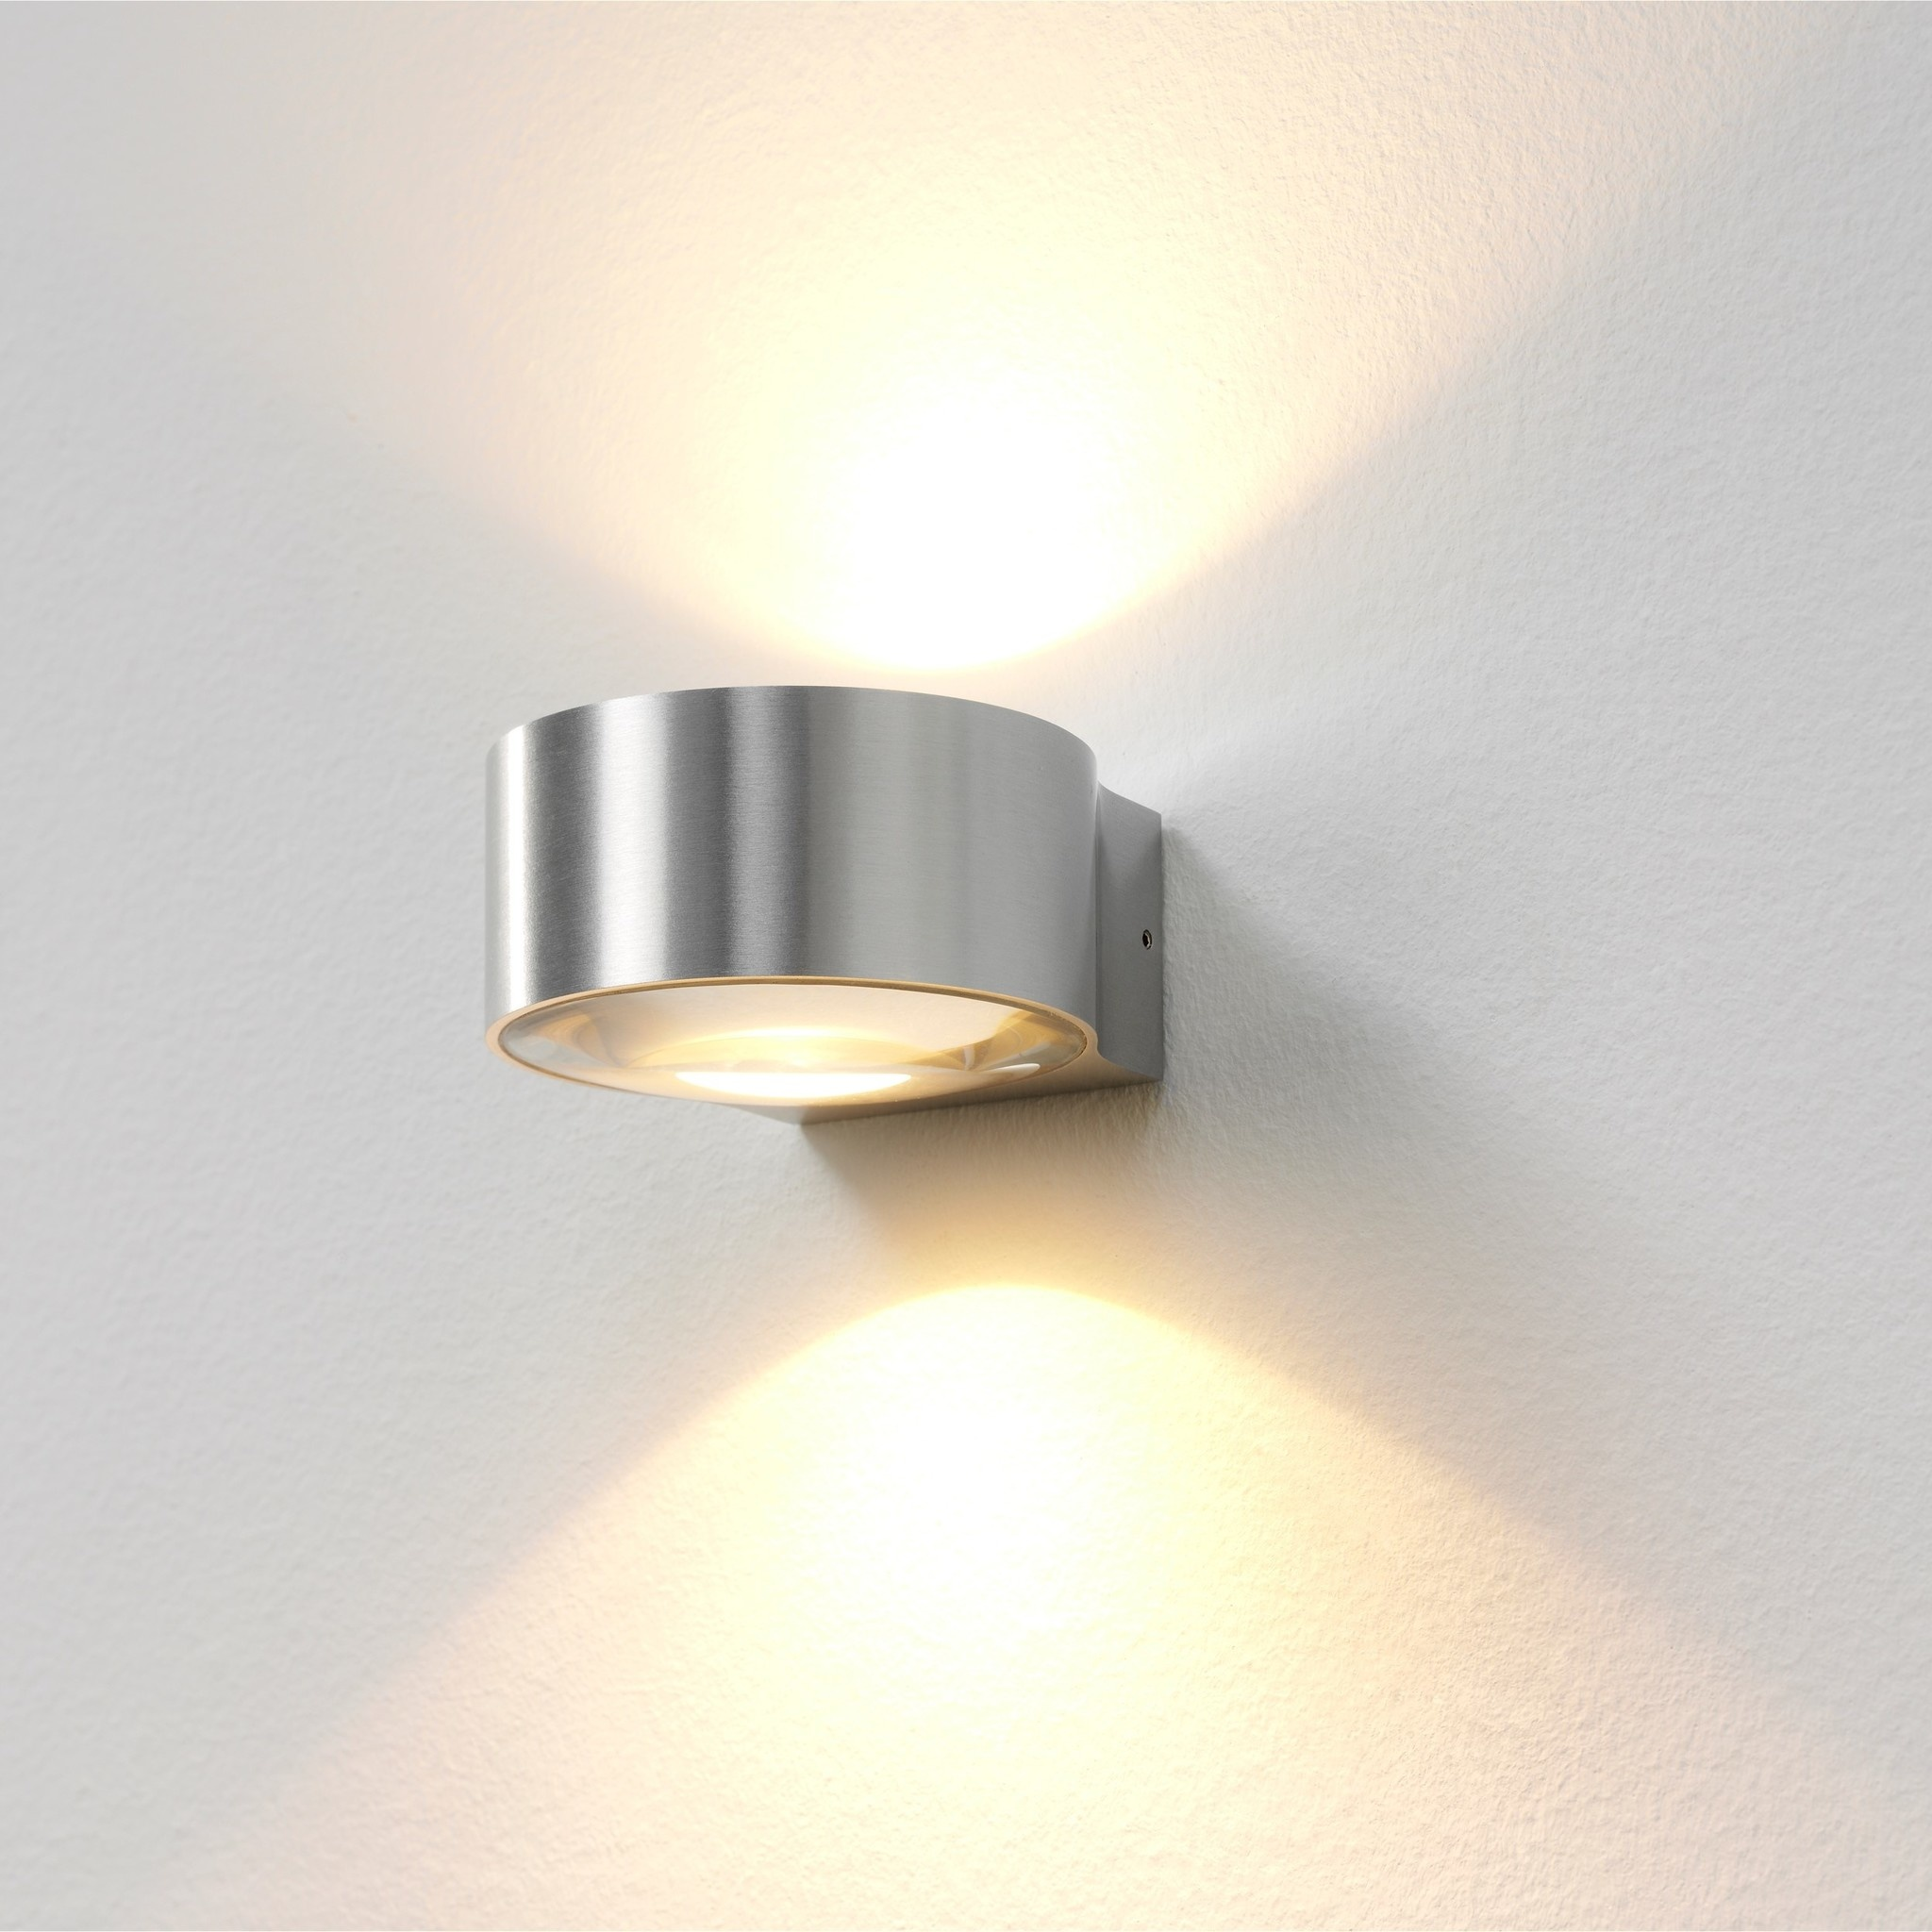 Artdelight Wandlamp Hudson Ø 11 cm aluminium